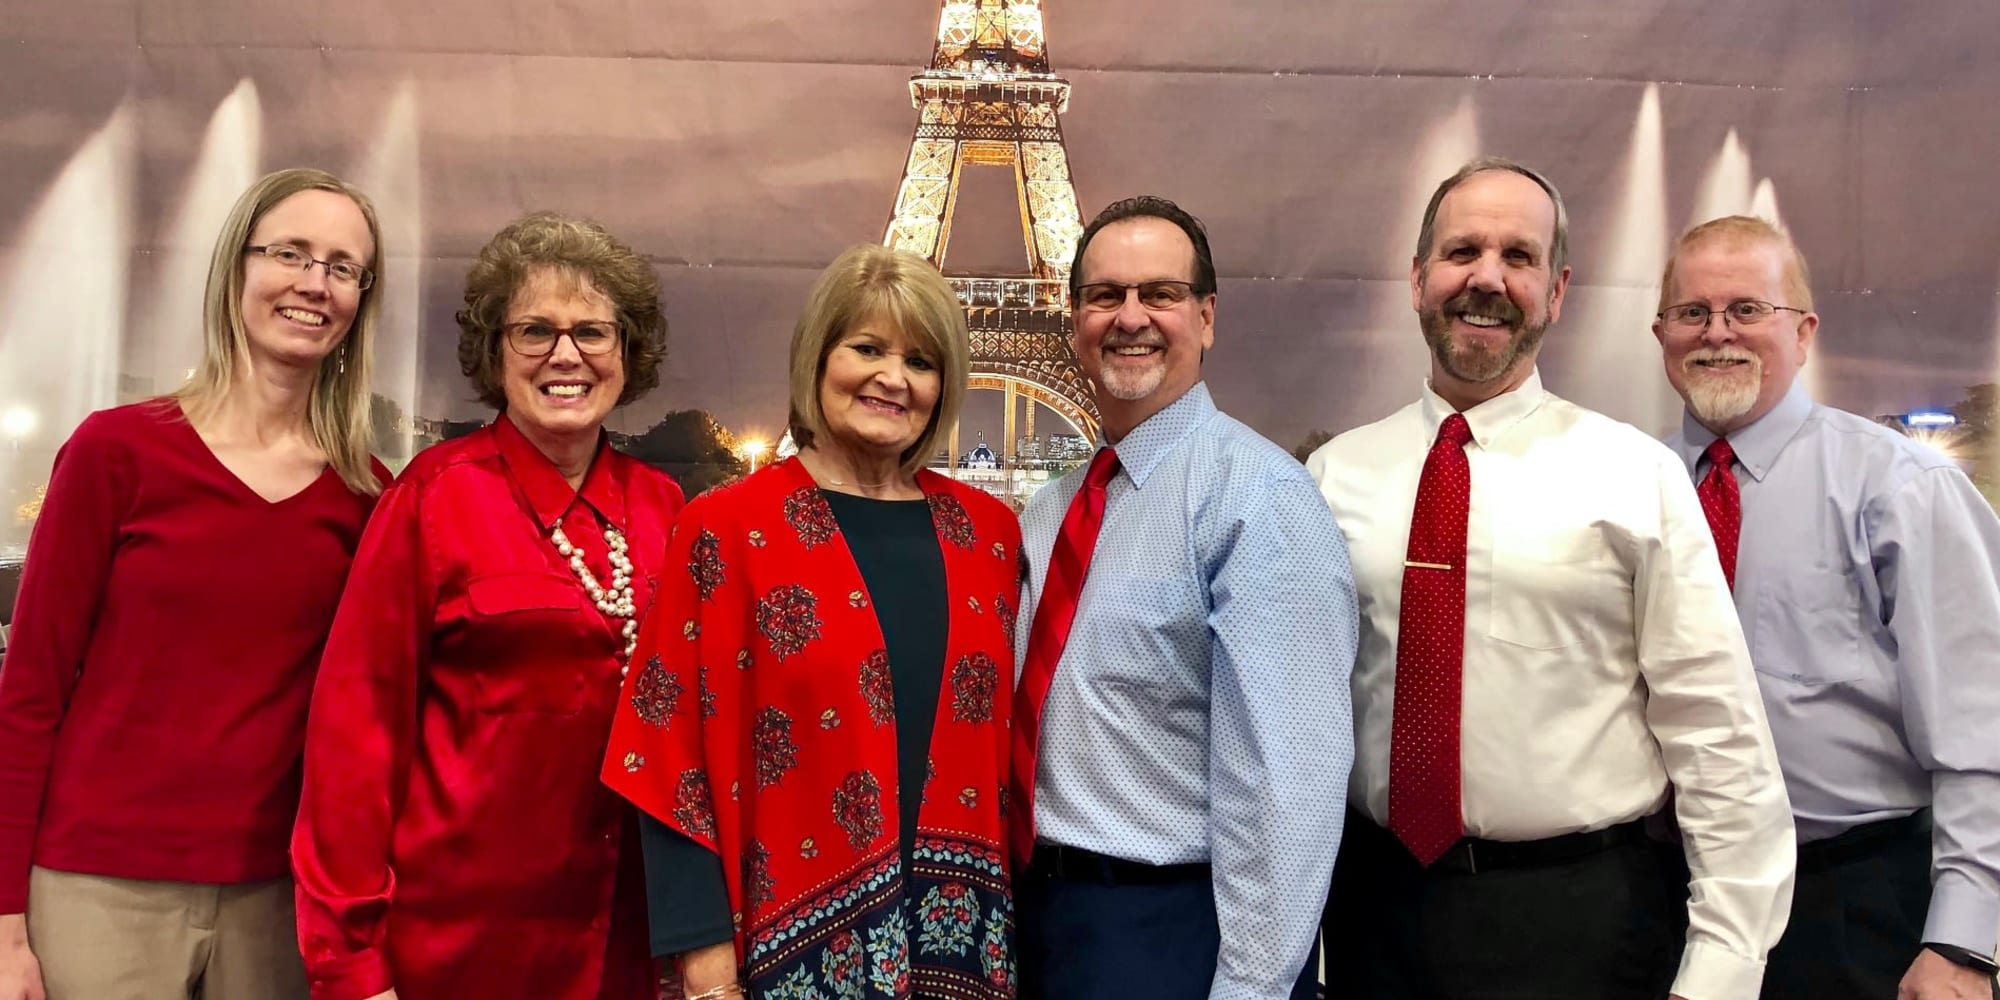 Management Team at Maple Ridge Gracious Retirement Living in Cedar Park, Texas